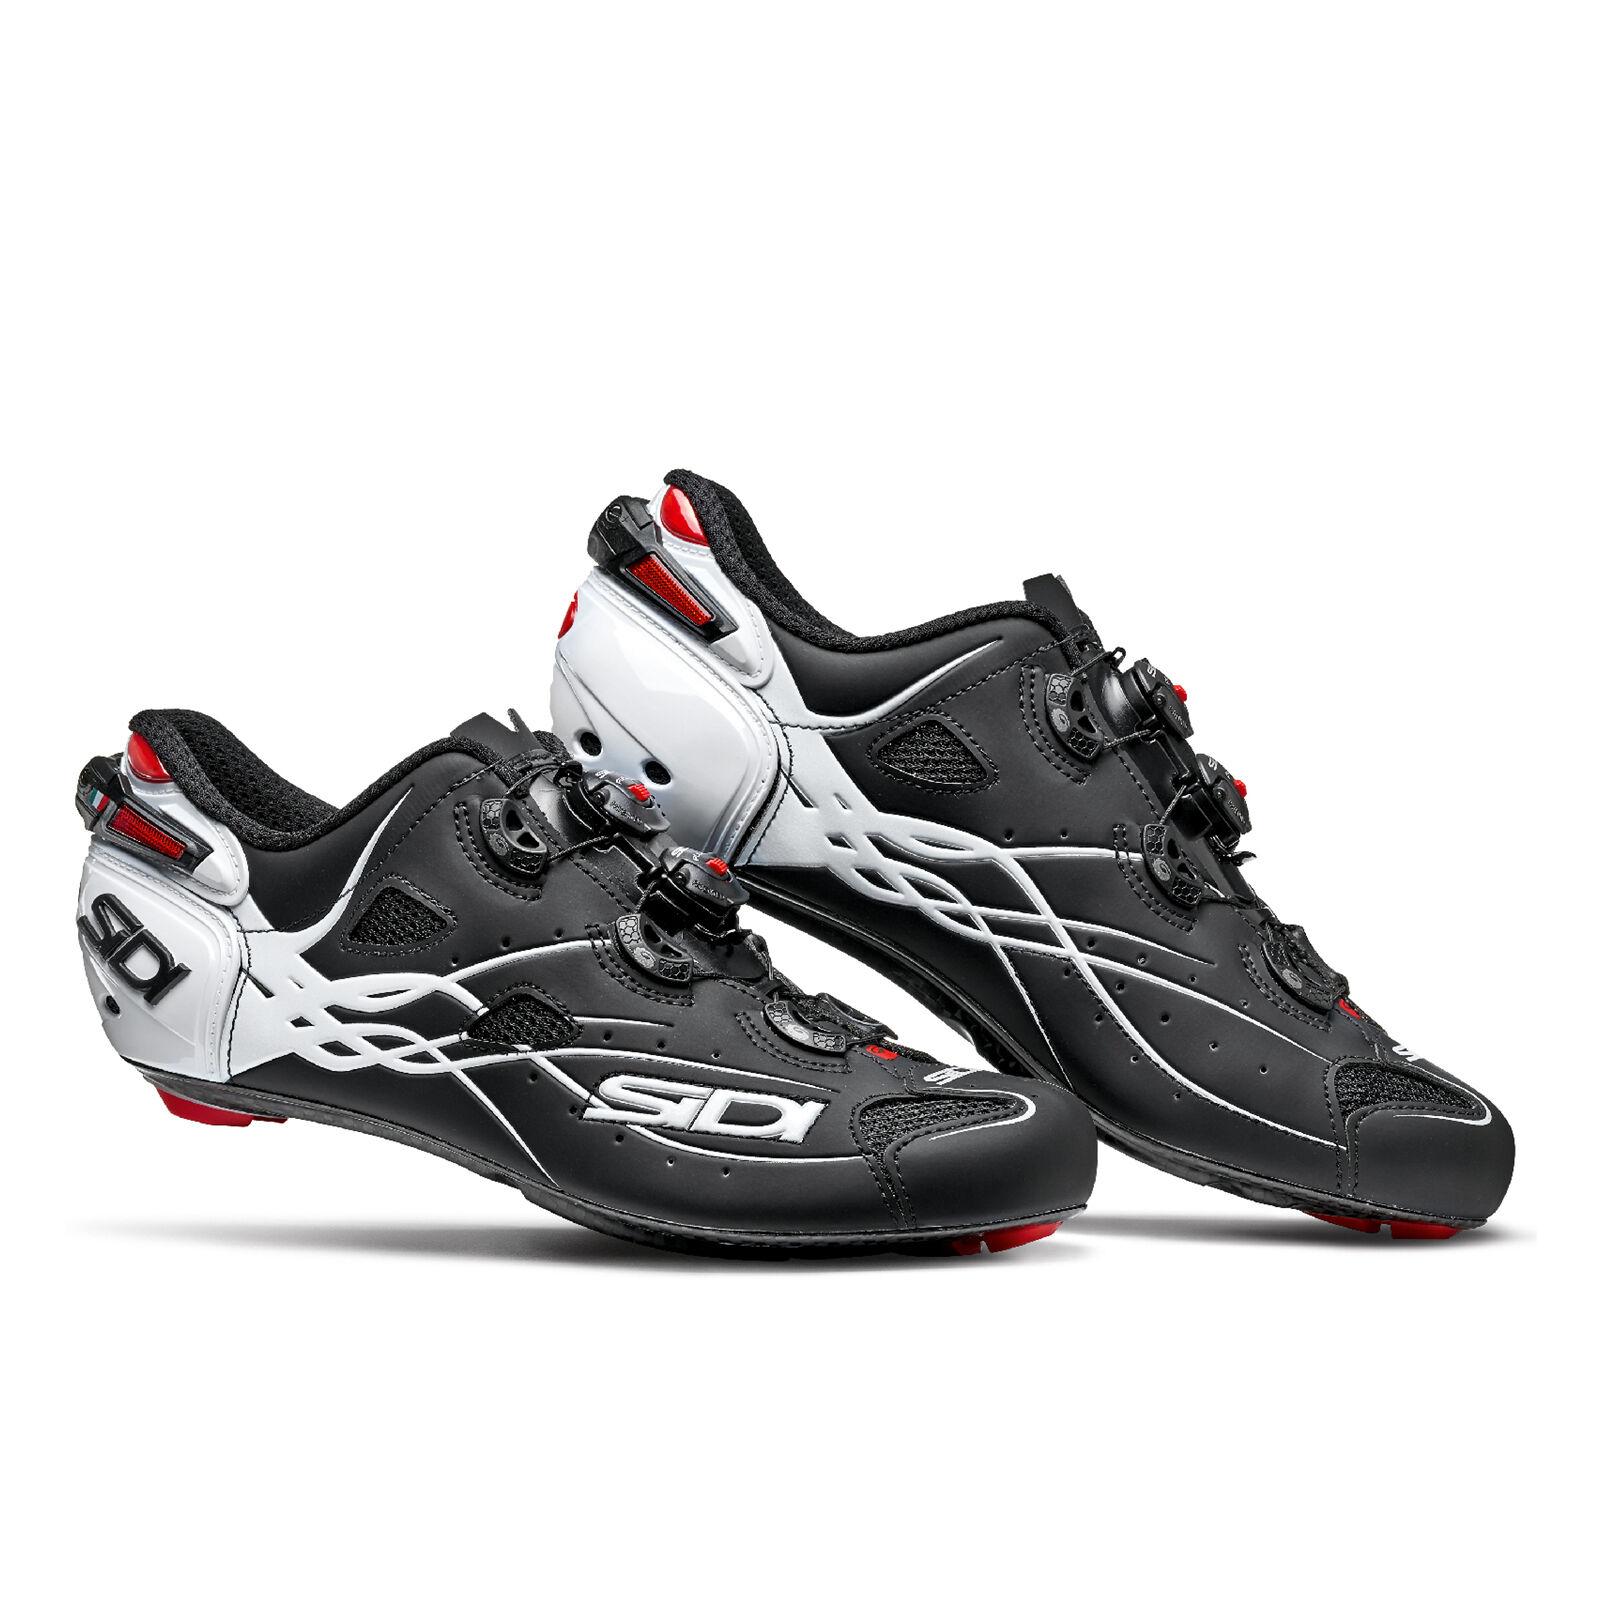 Sidi Shot Carbon Road Shoes - Matt Black/Gloss White - EU 44 - Matt Black/Gloss White